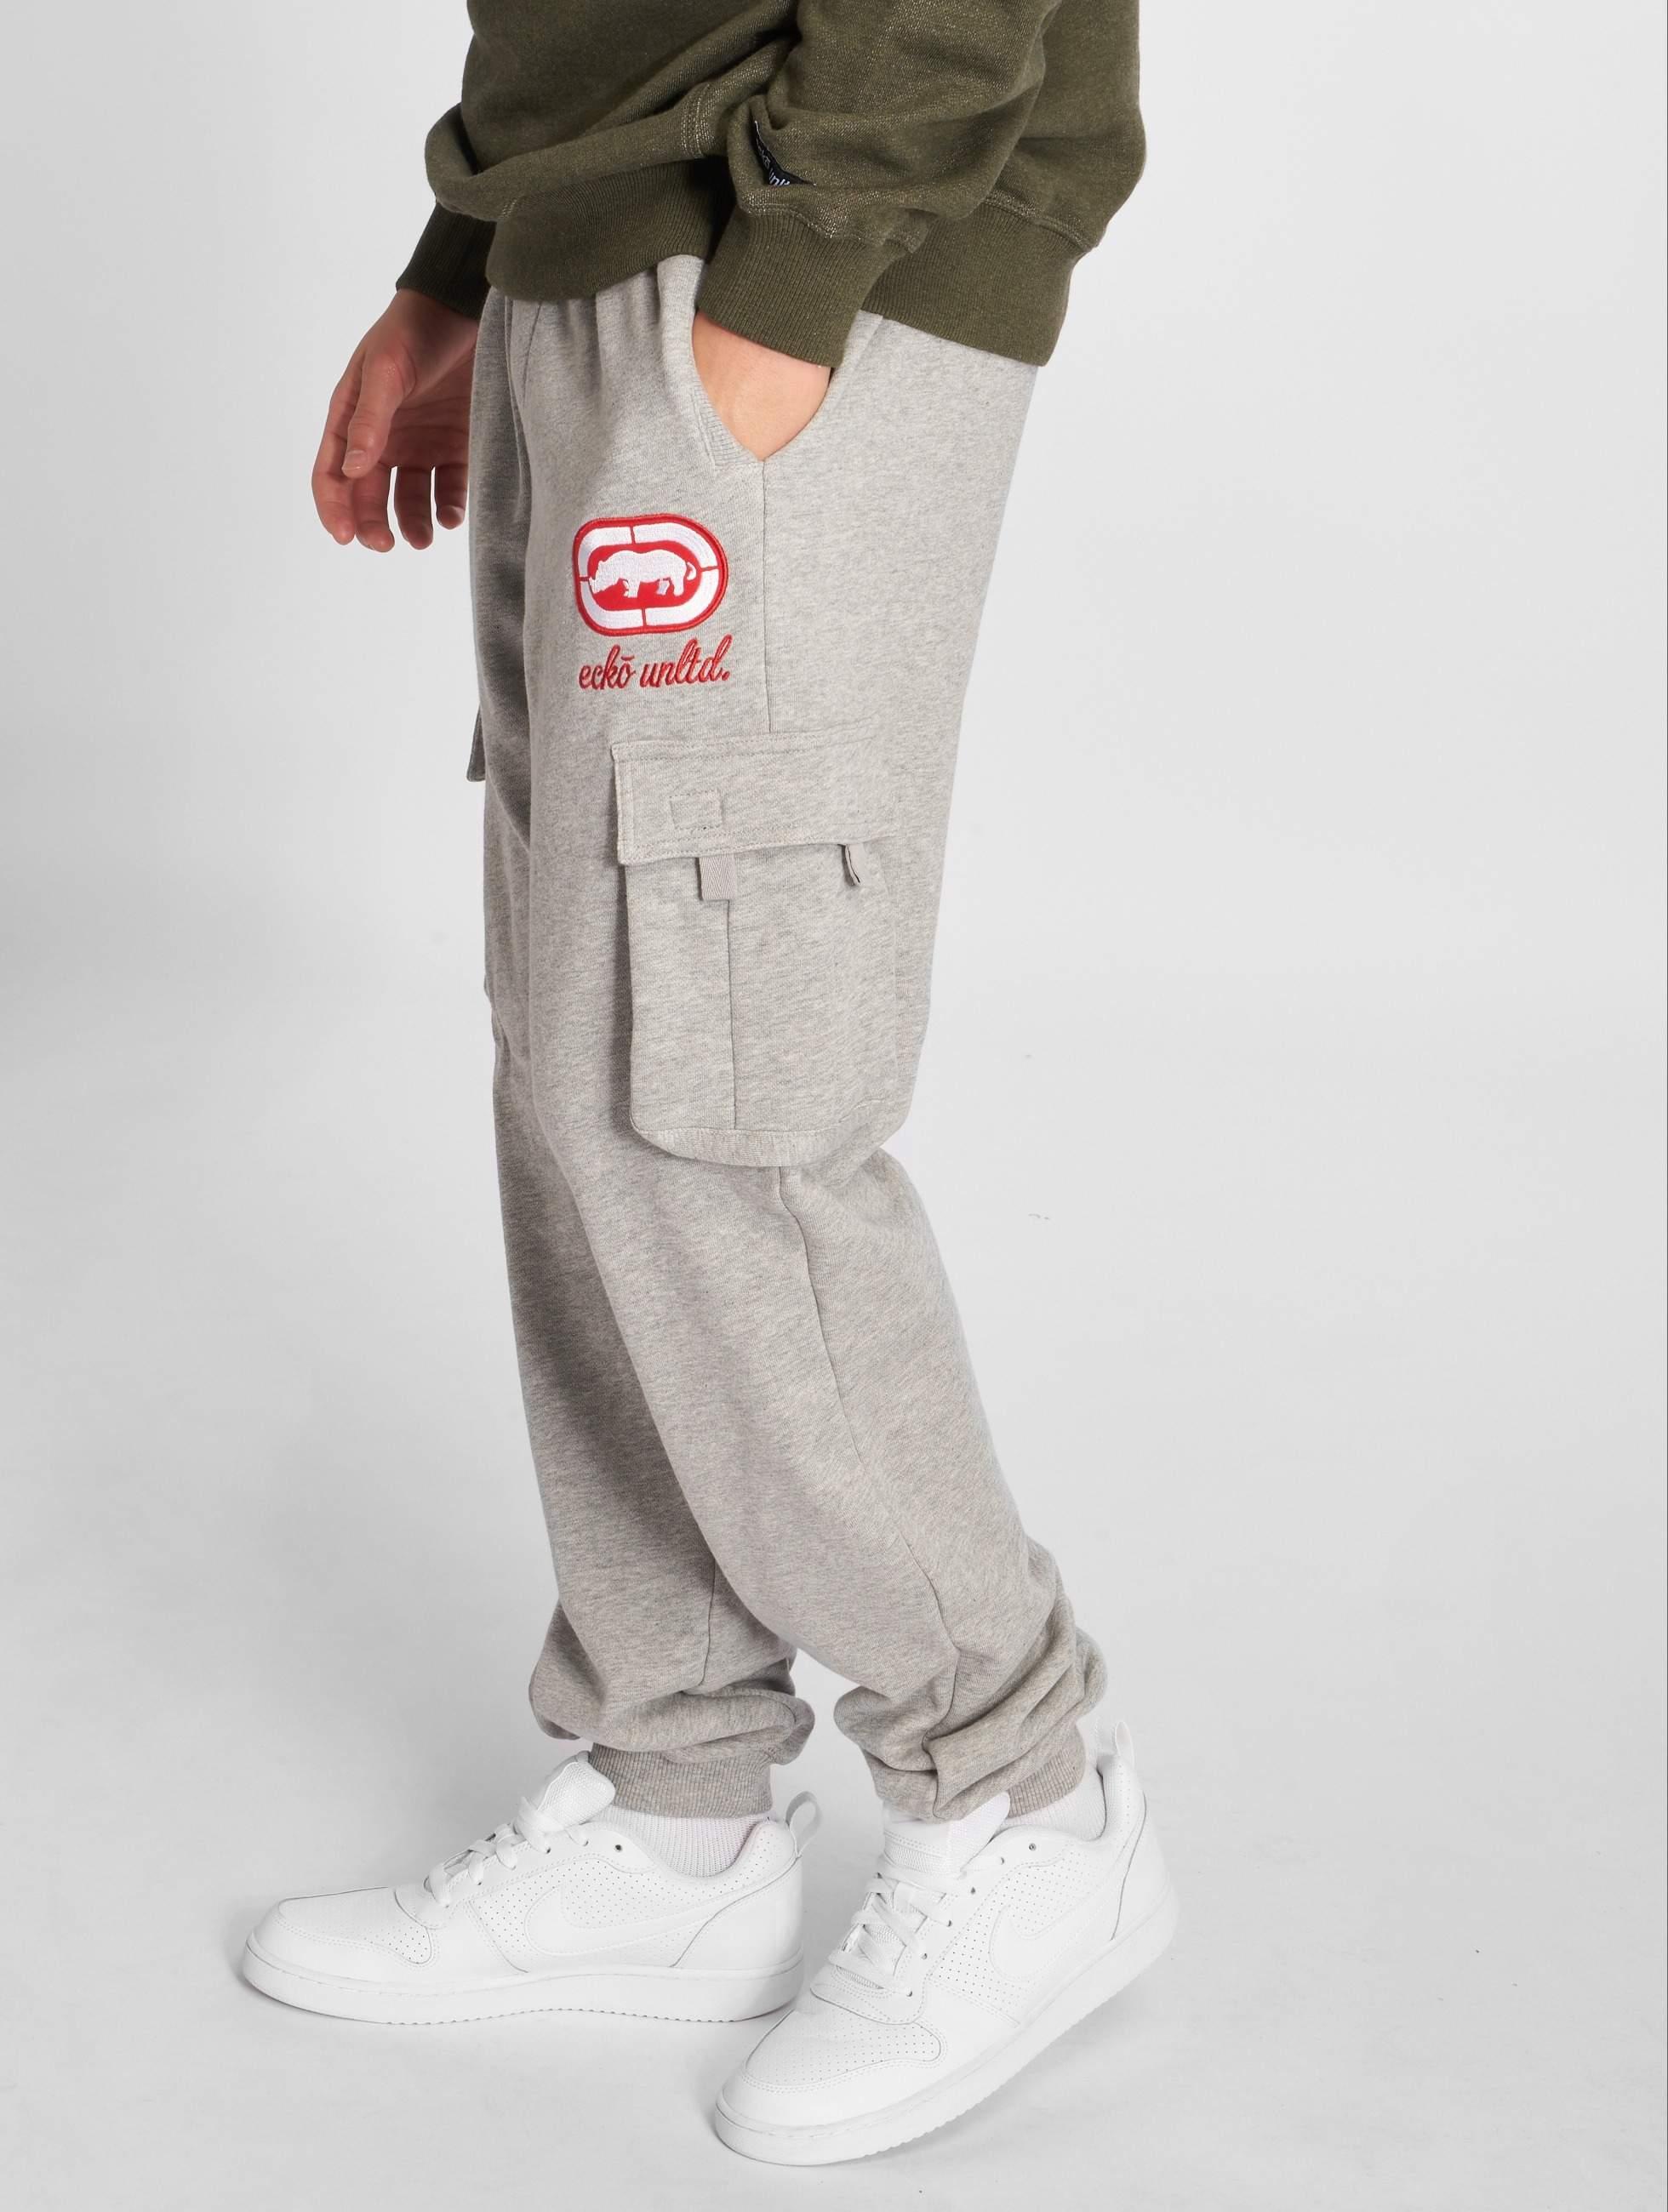 Ecko Unltd. / Sweat Pant Oliver Way in grey S